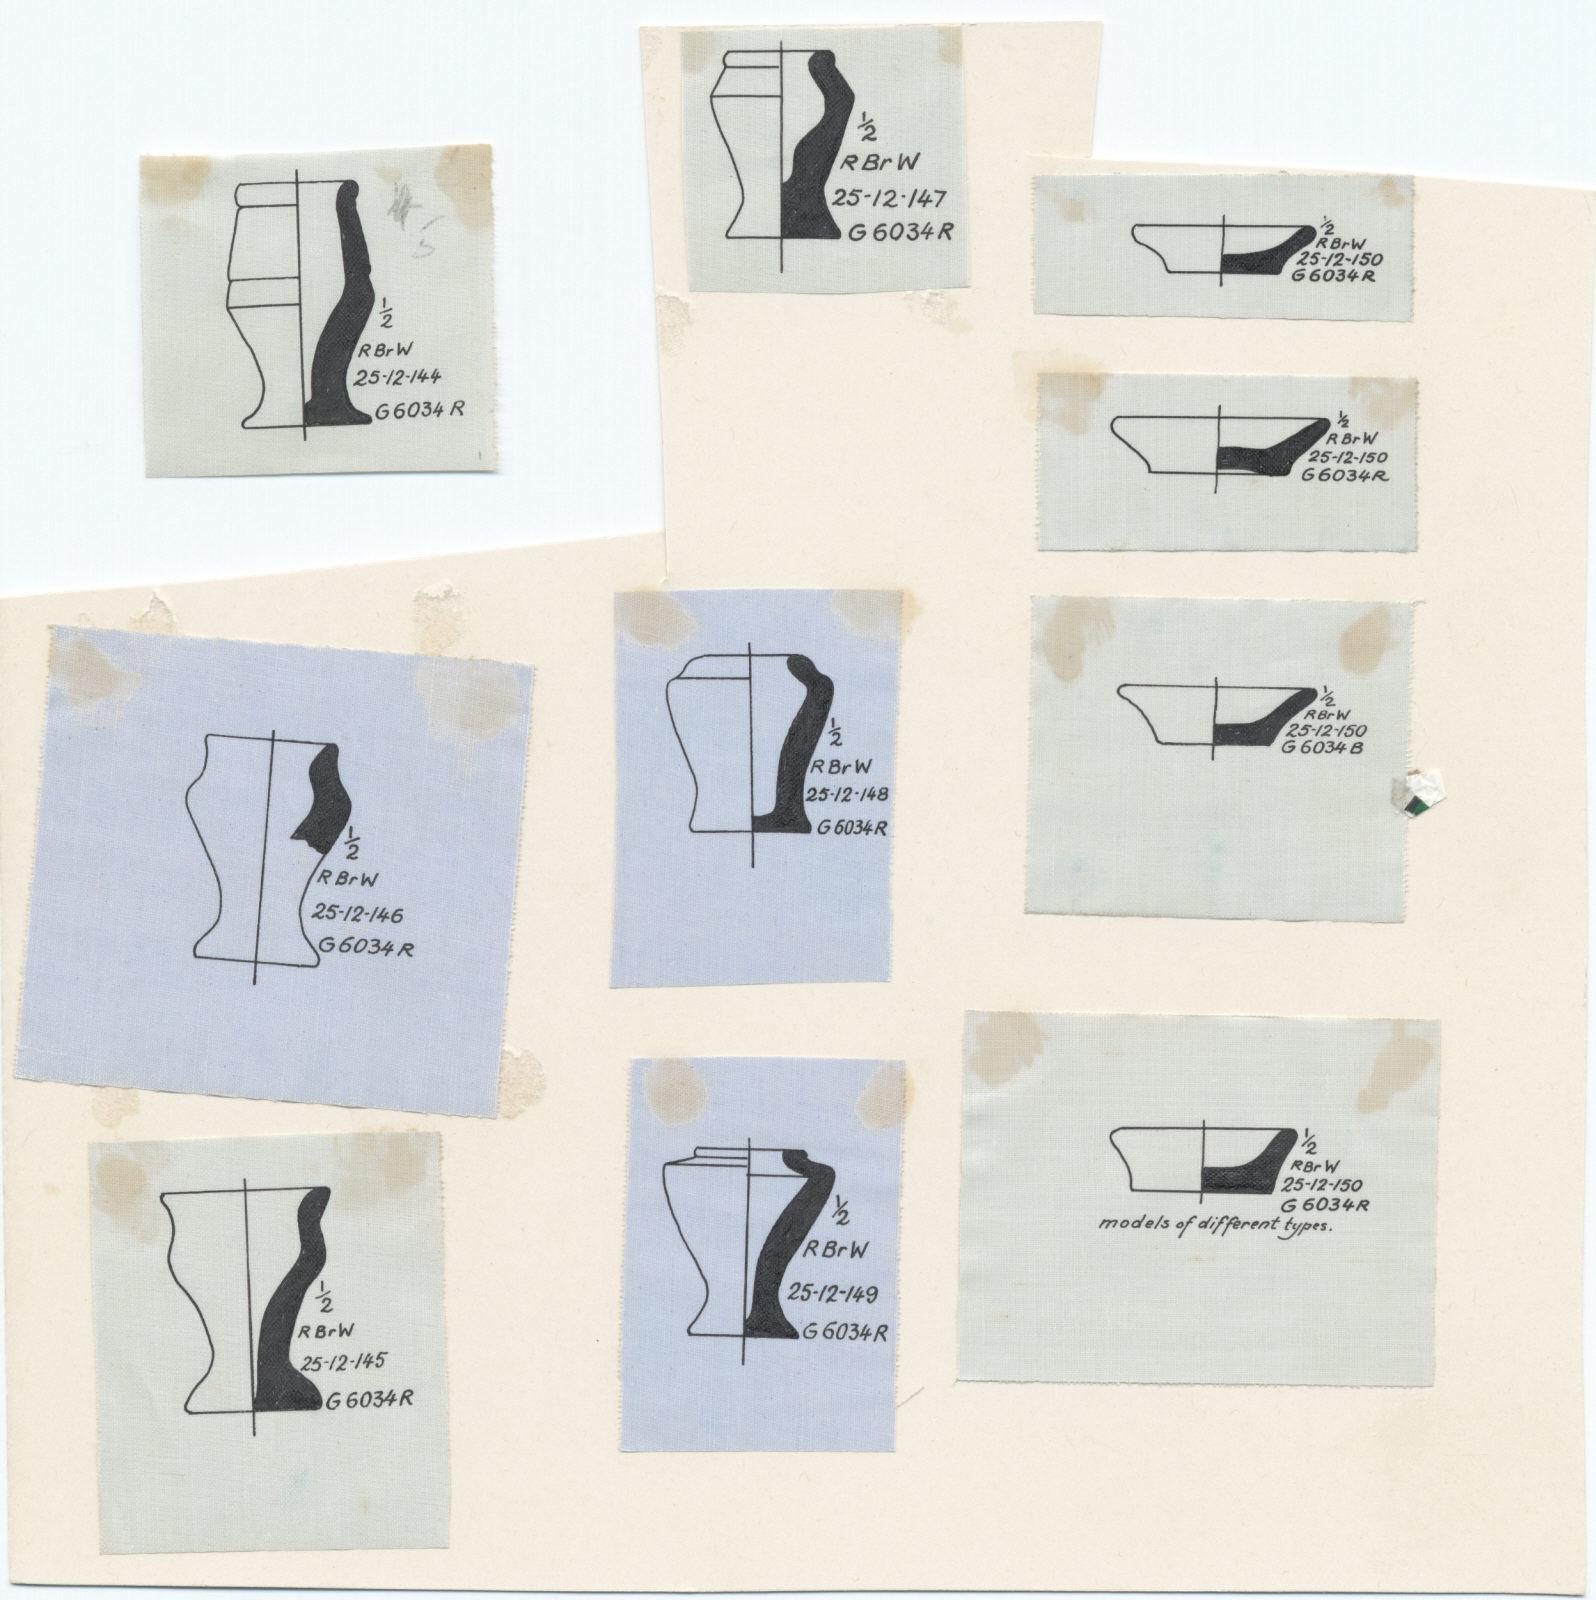 Drawings: G 6034, Shaft R: pottery, model vessels